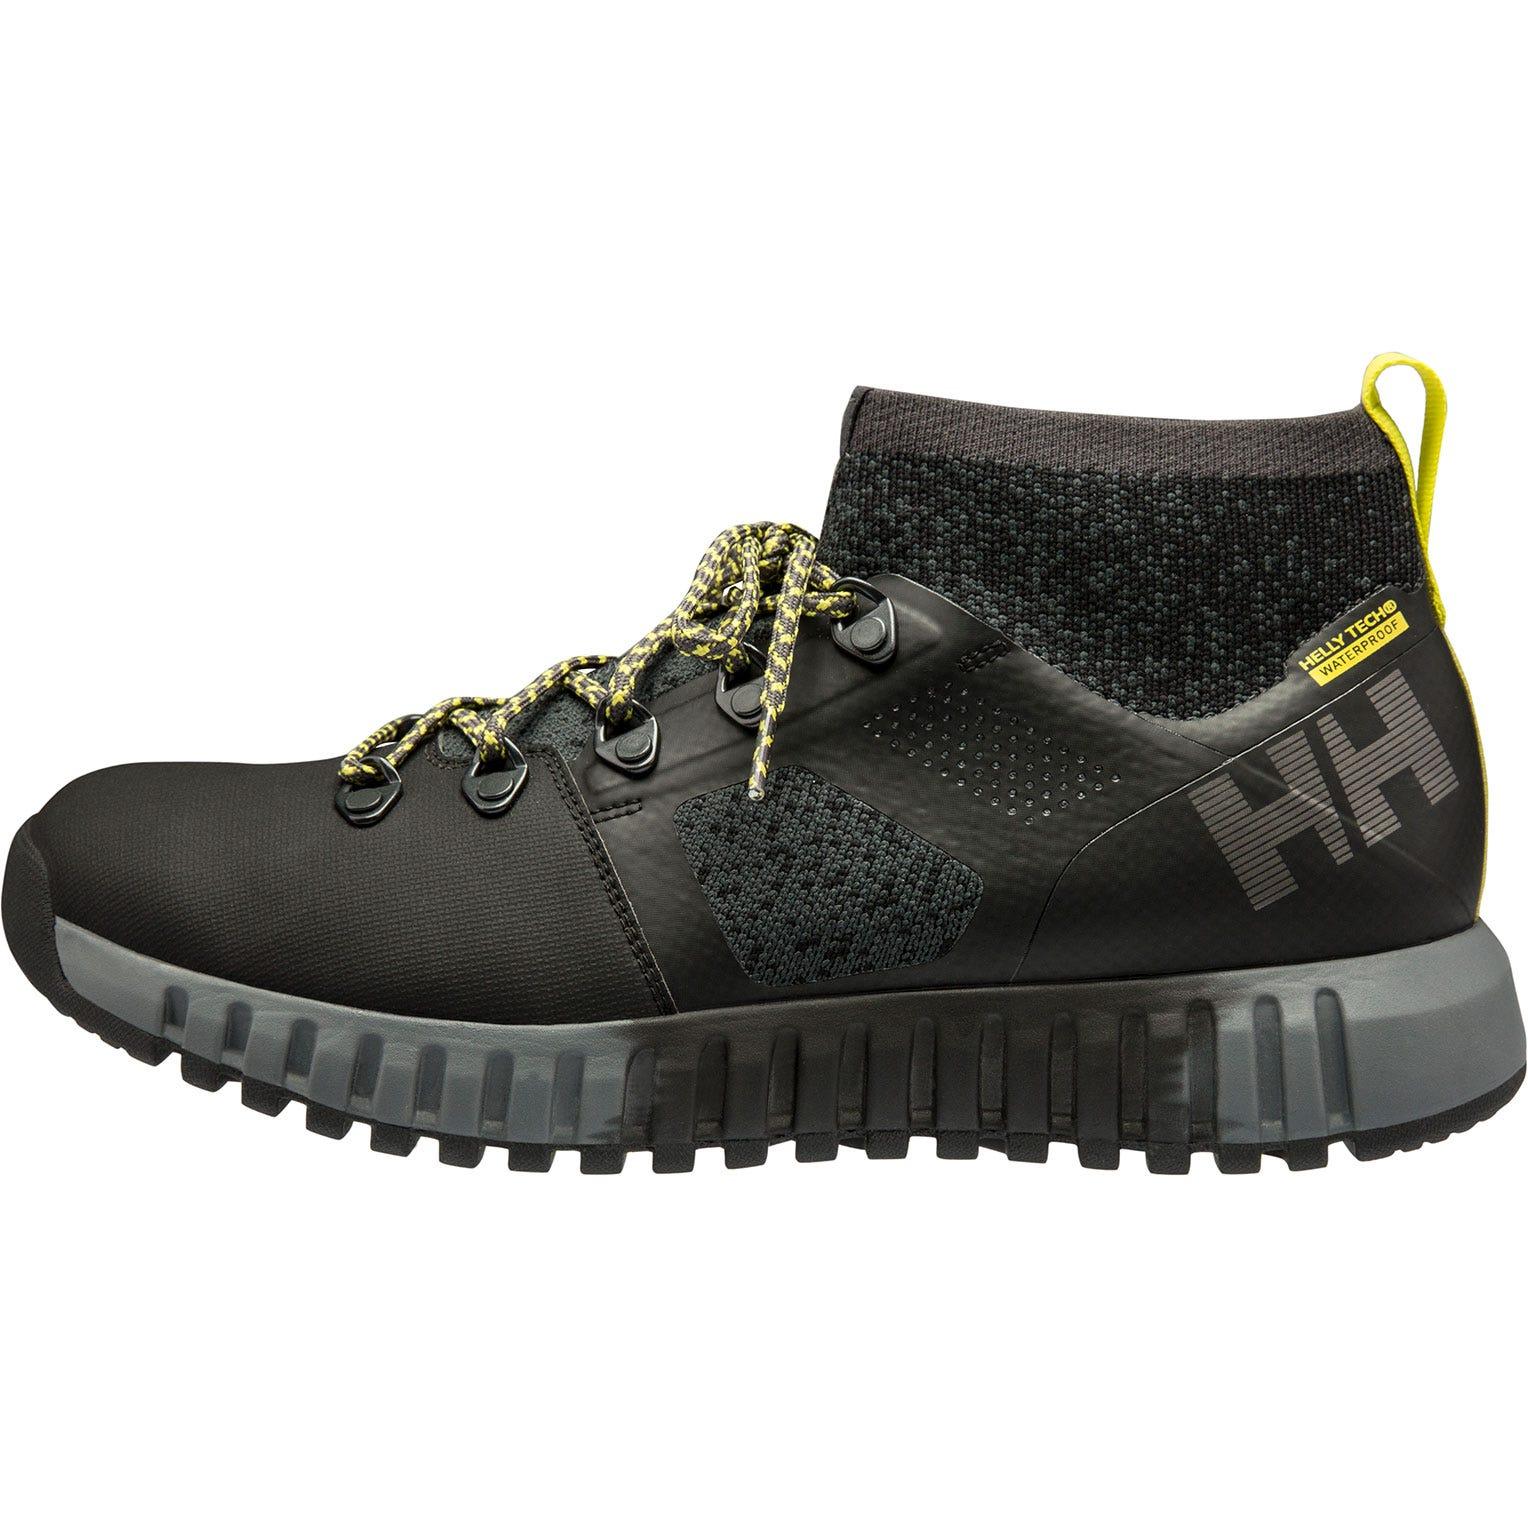 Helly Hansen Vanir Canter Ht Mens Hiking Boot Black 41/8